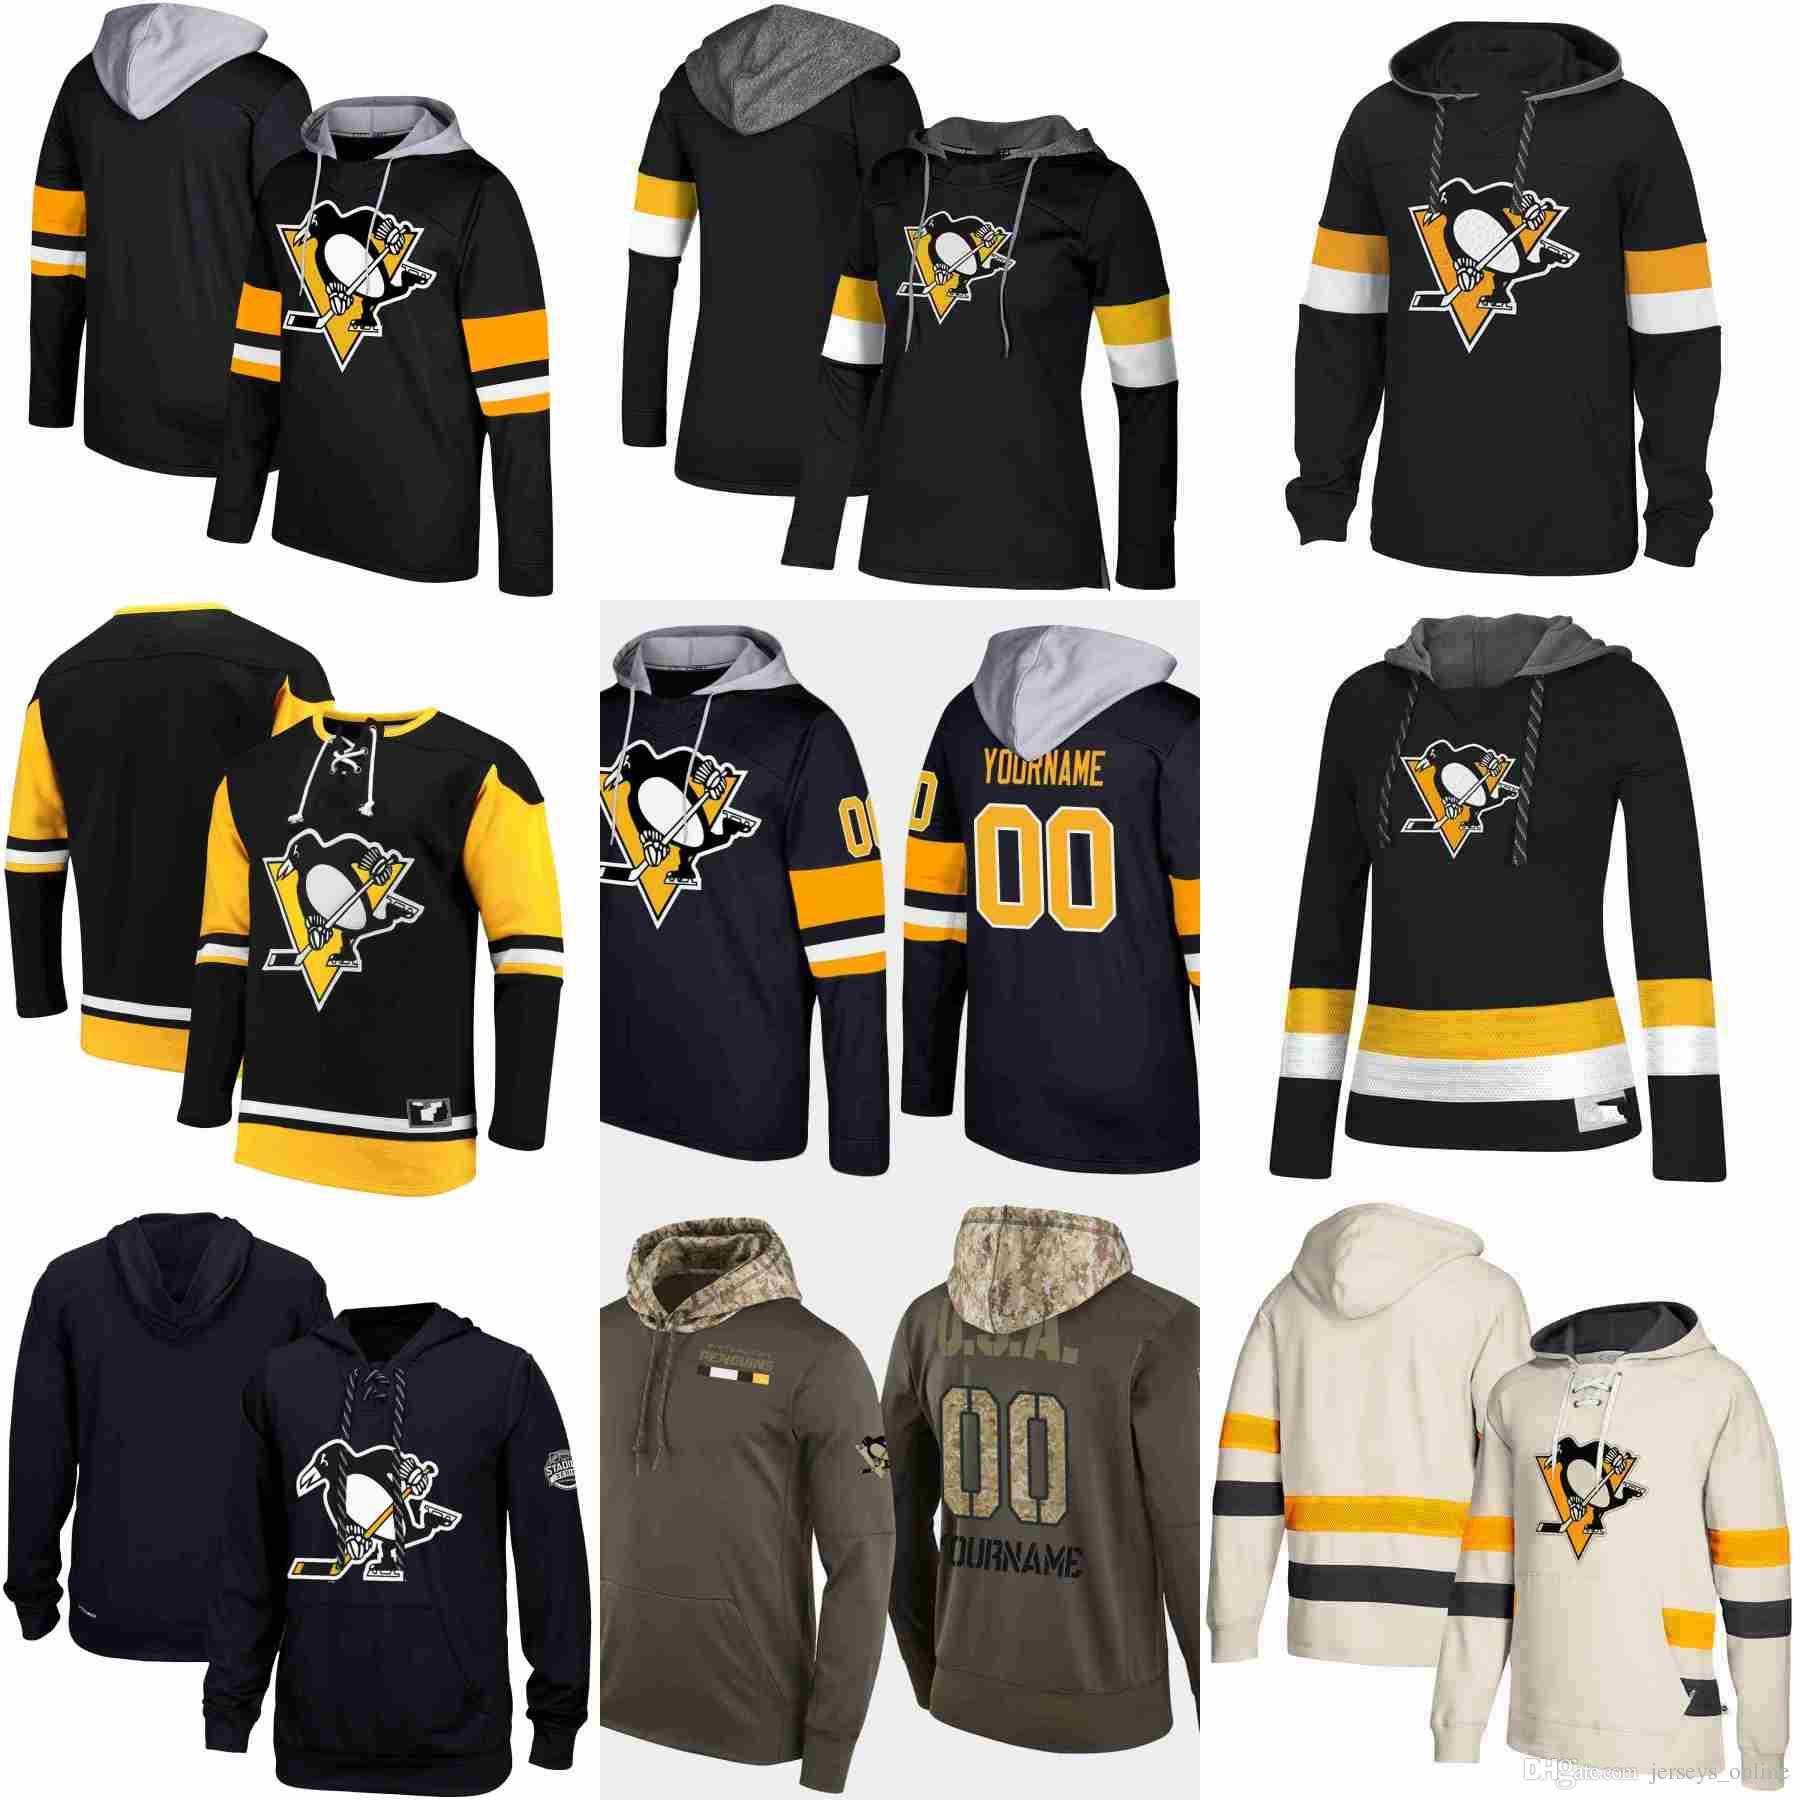 2019 Pittsburgh Penguins Hoodie Sidney Crosby Evgeni Malkin Jake Guentzel  Kris Letang Patric Hornqvist Hockey Jersey Sweatshirt Stitched From  Jerseys online ... 28a55f1c0